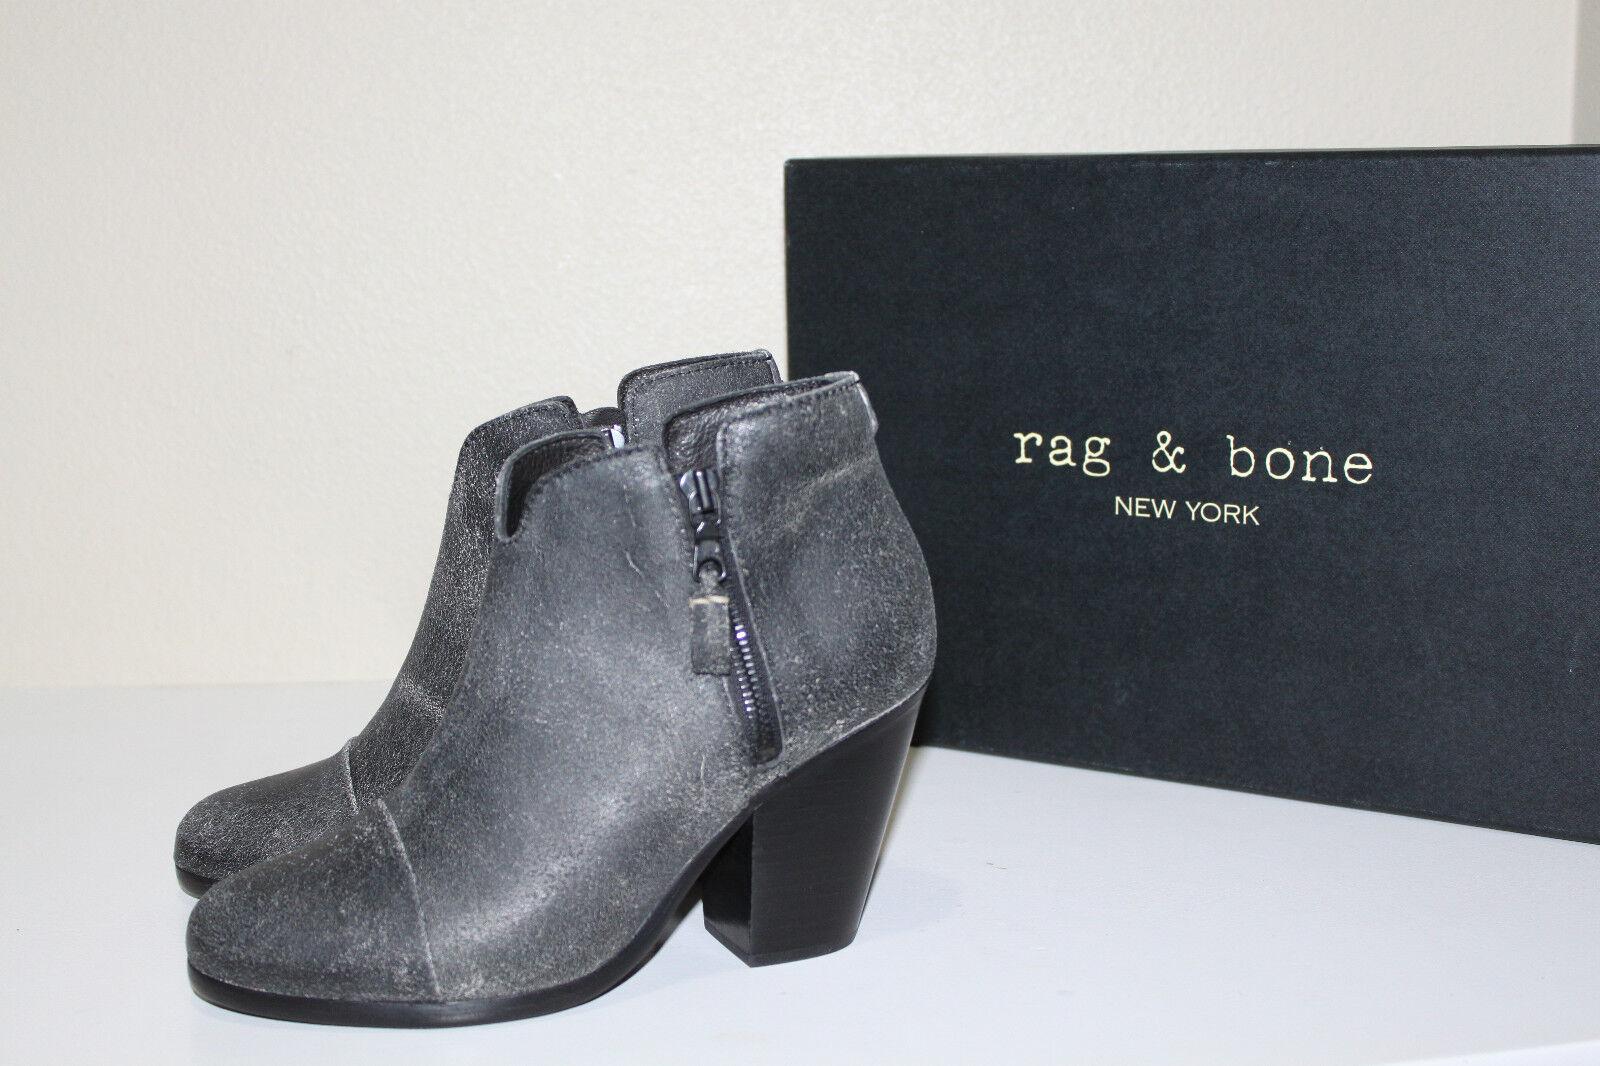 New sz 6 / 36 Rag & Bone Margot Gray Black Suede Ankle Bootie Heel Shoes